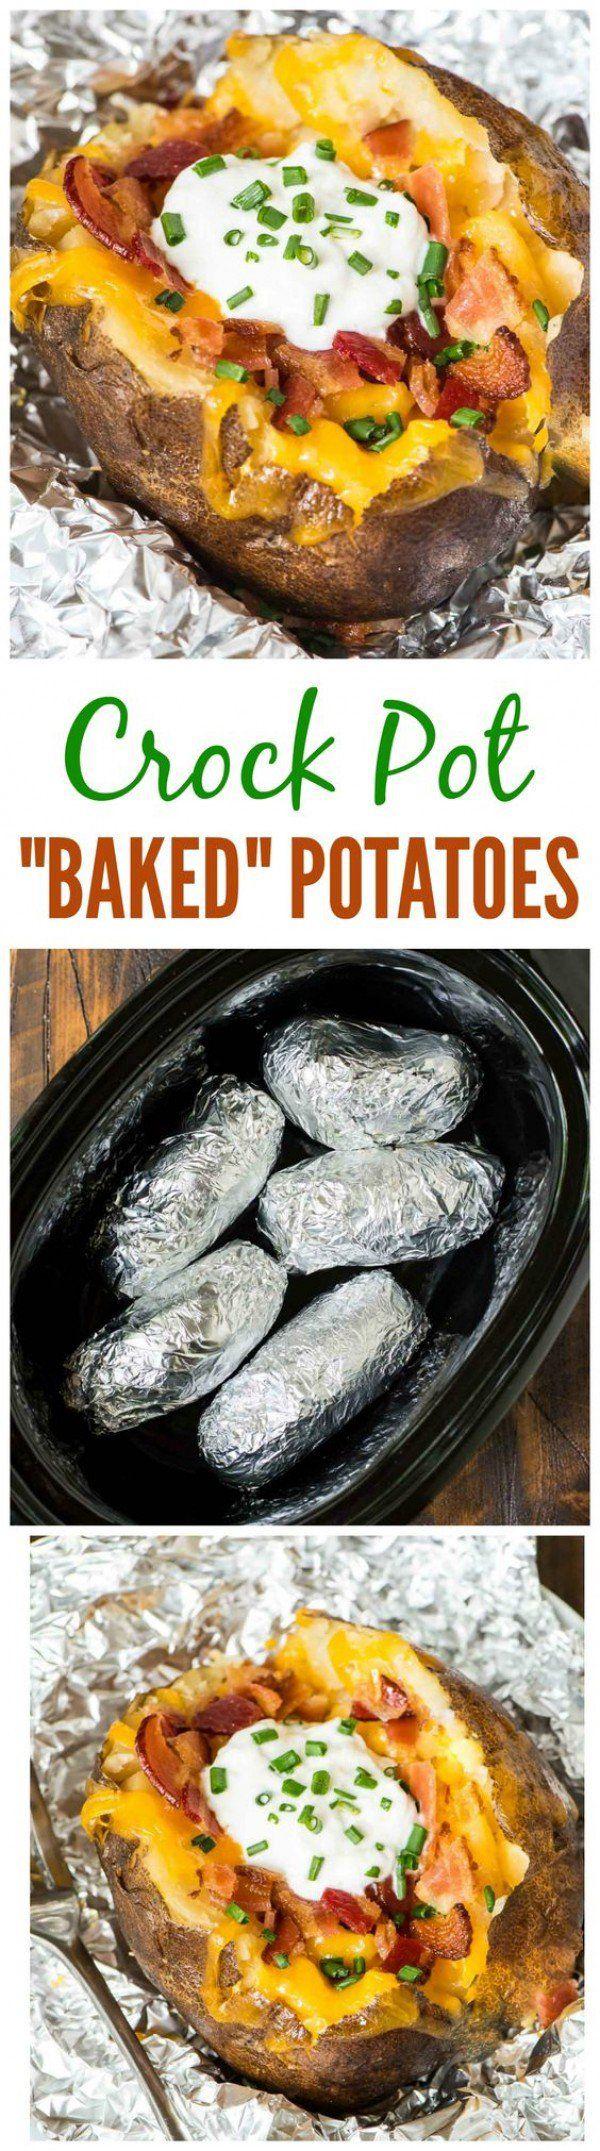 Get the recipe ♥ Crock Pot Baked Potatoes @recipes_to_go